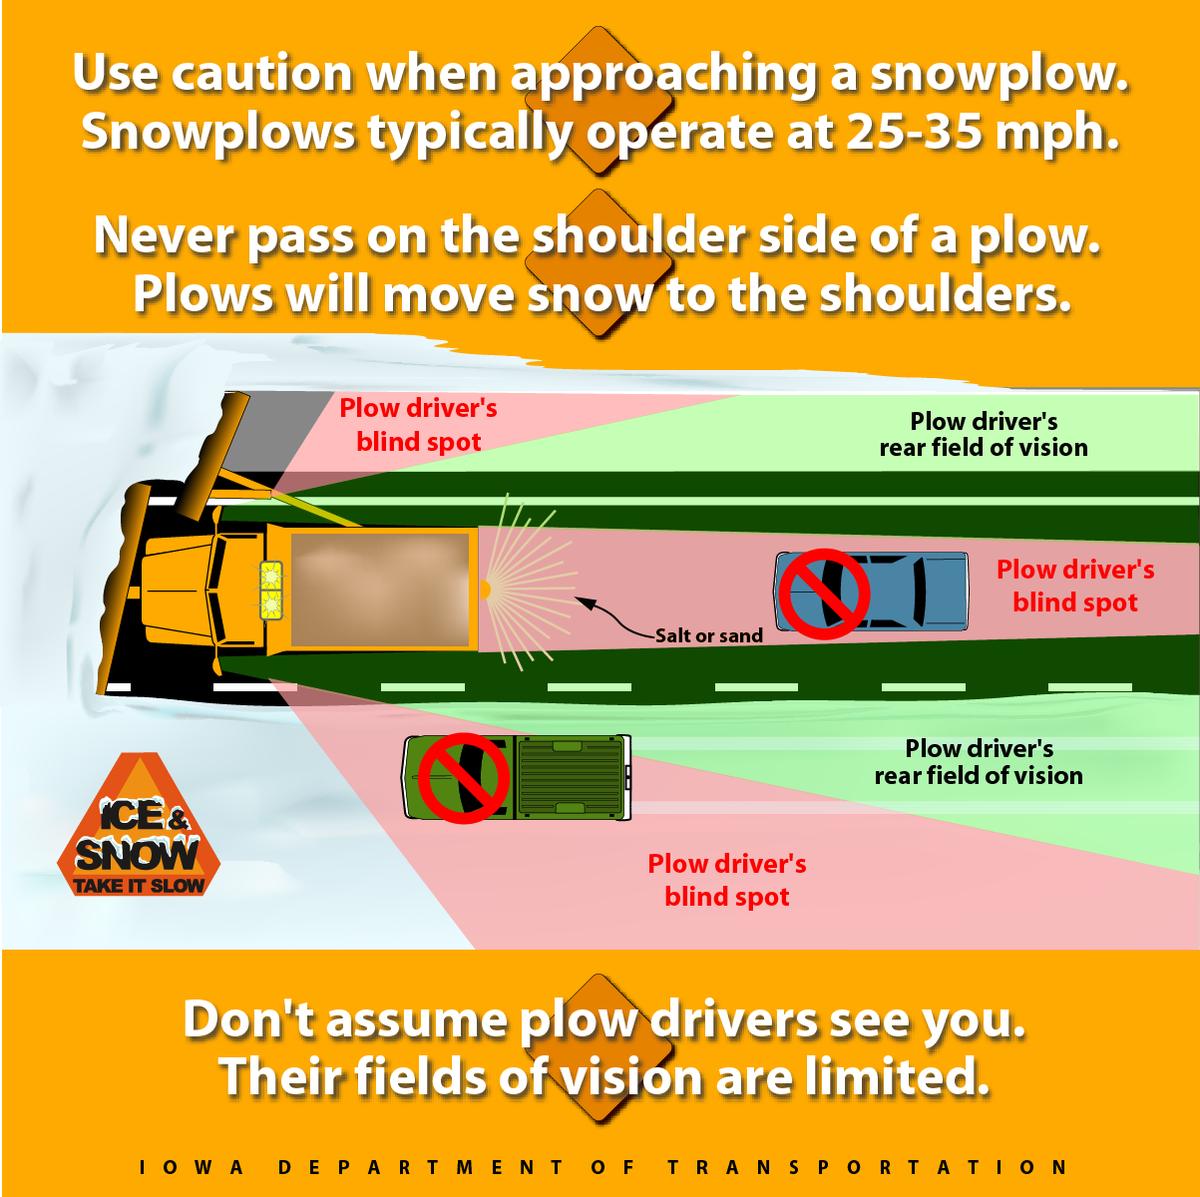 Snow plow vision